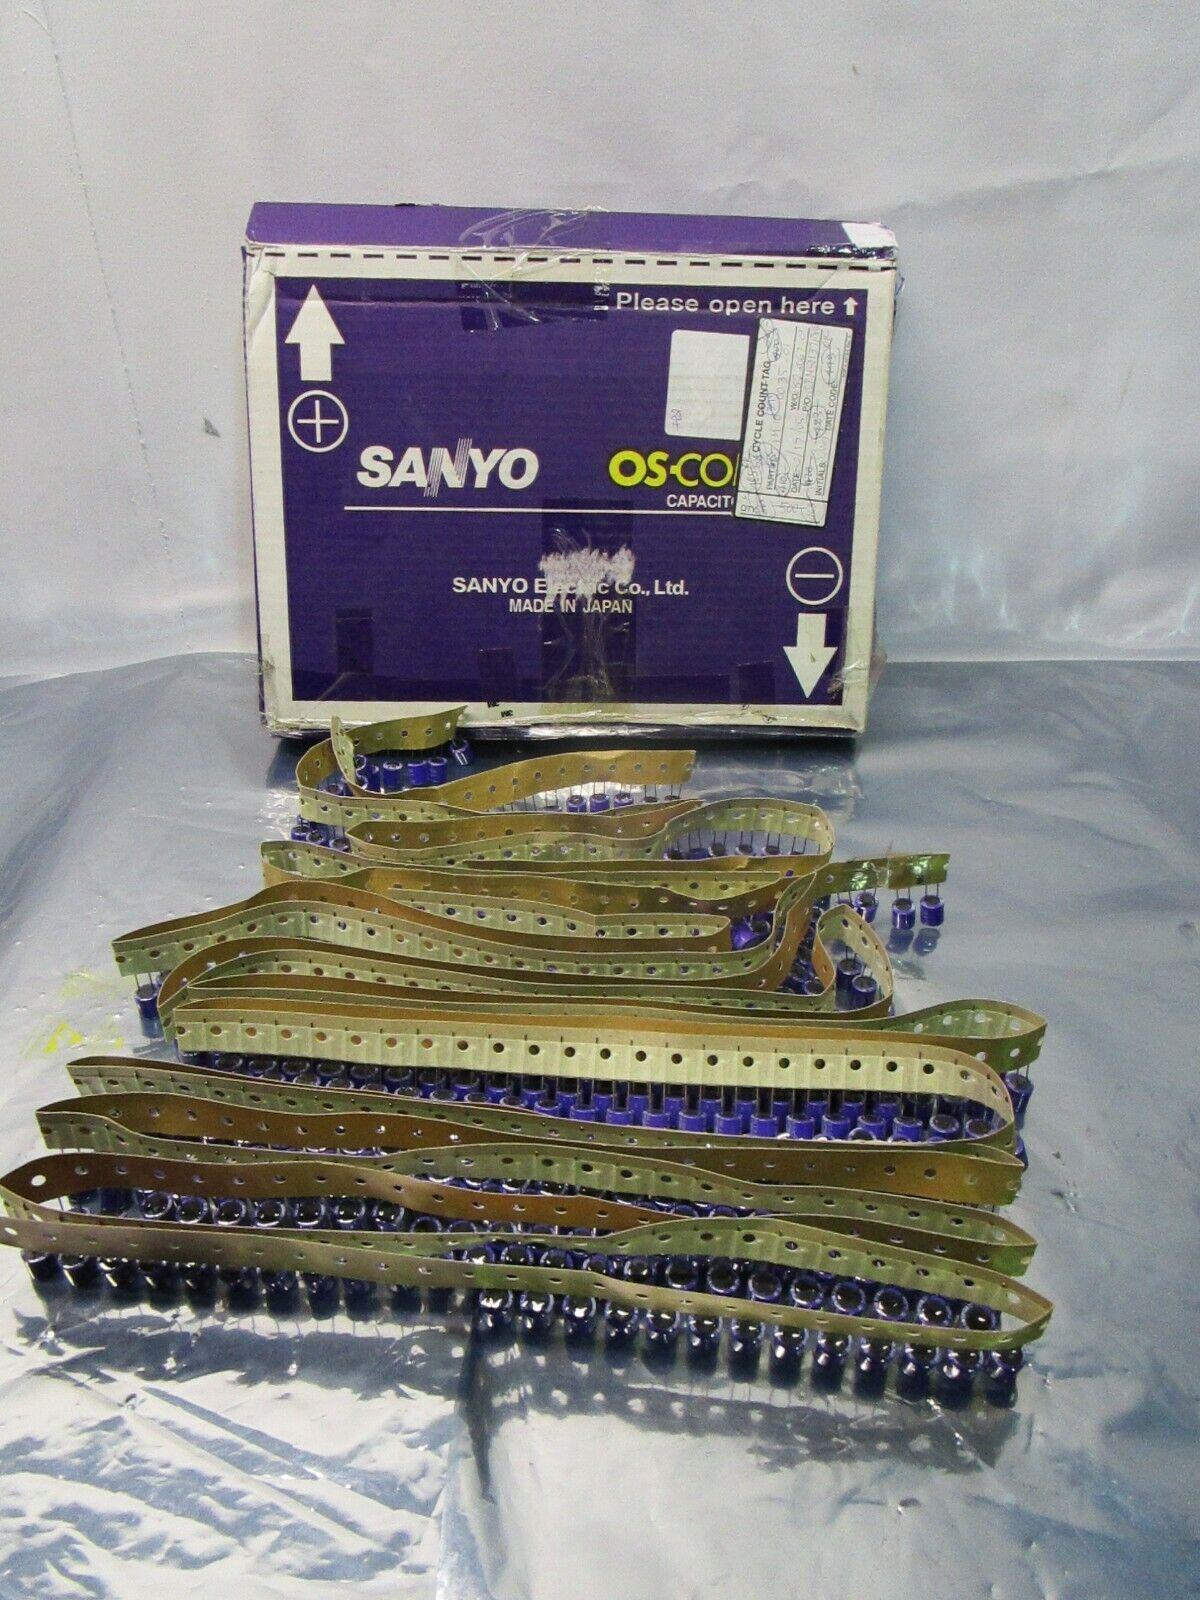 1 Lot of 462 Sanyo 270uF OS-CON Capacitor, 16V, 102553